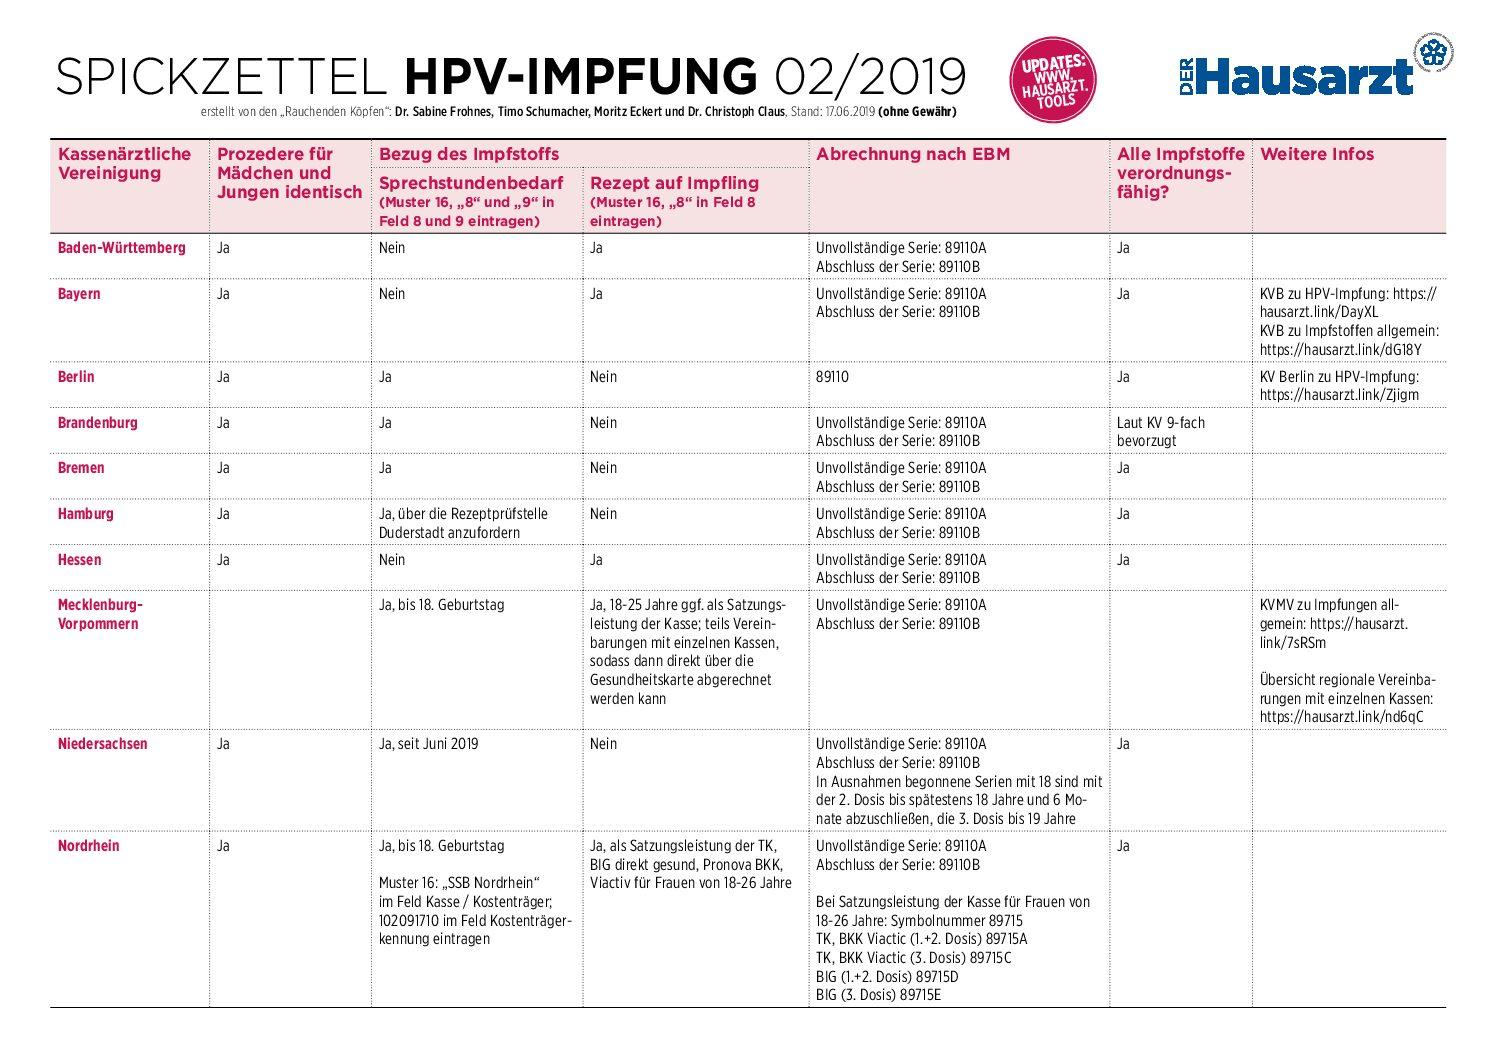 virus del papiloma humano caracteristicas del virus cervical high risk hpv (human papillomavirus) test positive icd 10